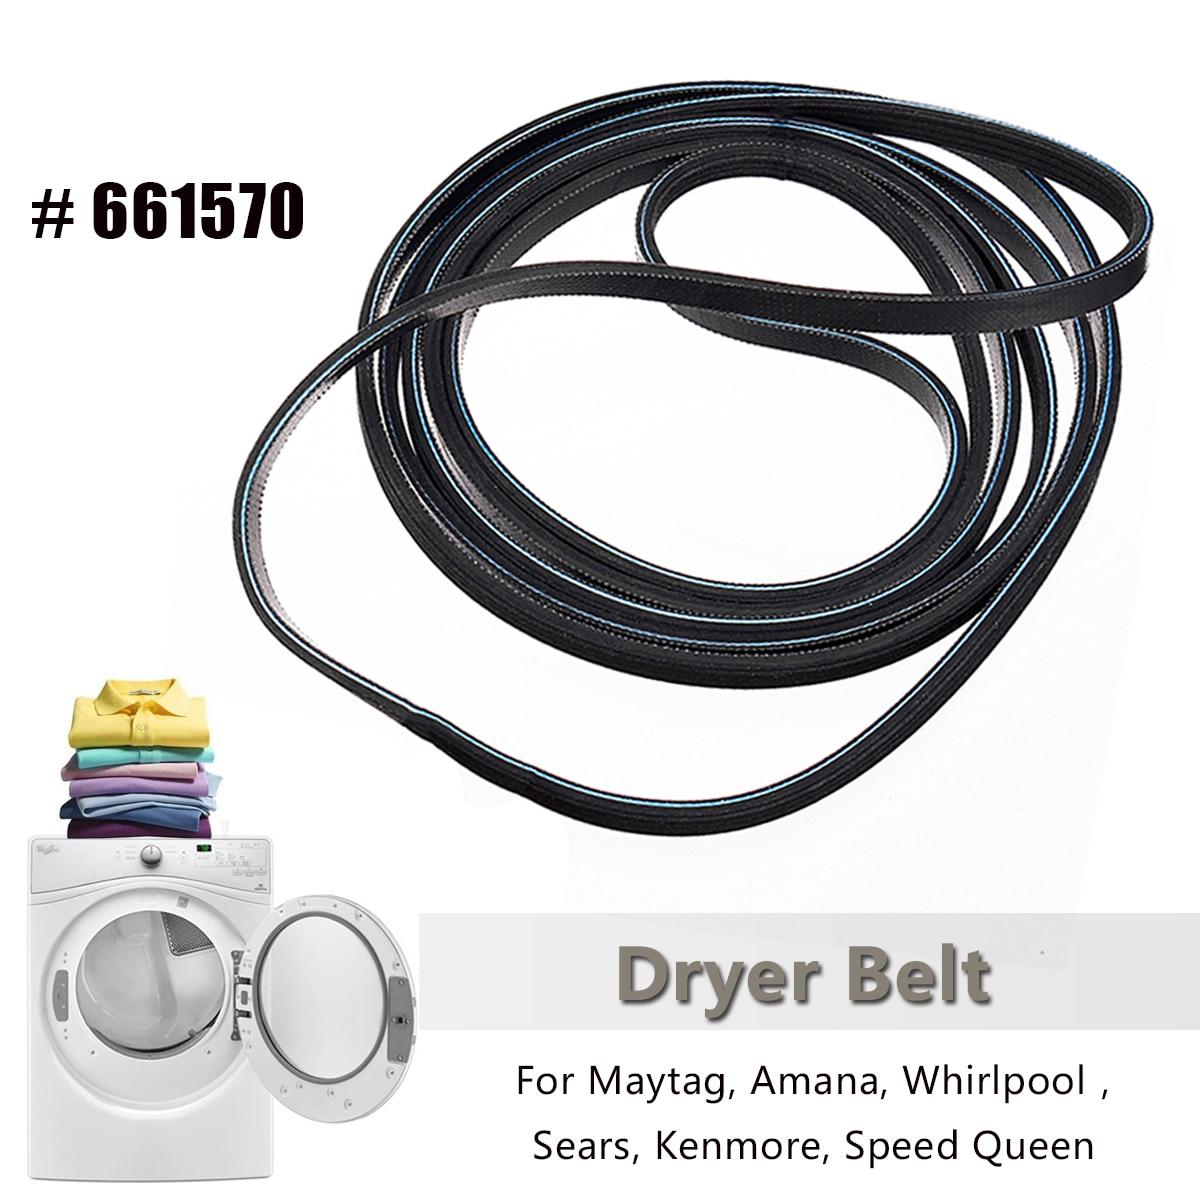 230cm*0.6cm Dryer Drum Belt For Whirlpool Sears Kenmore Maytag Amana 661570 3387610 AP2911808 PS382430